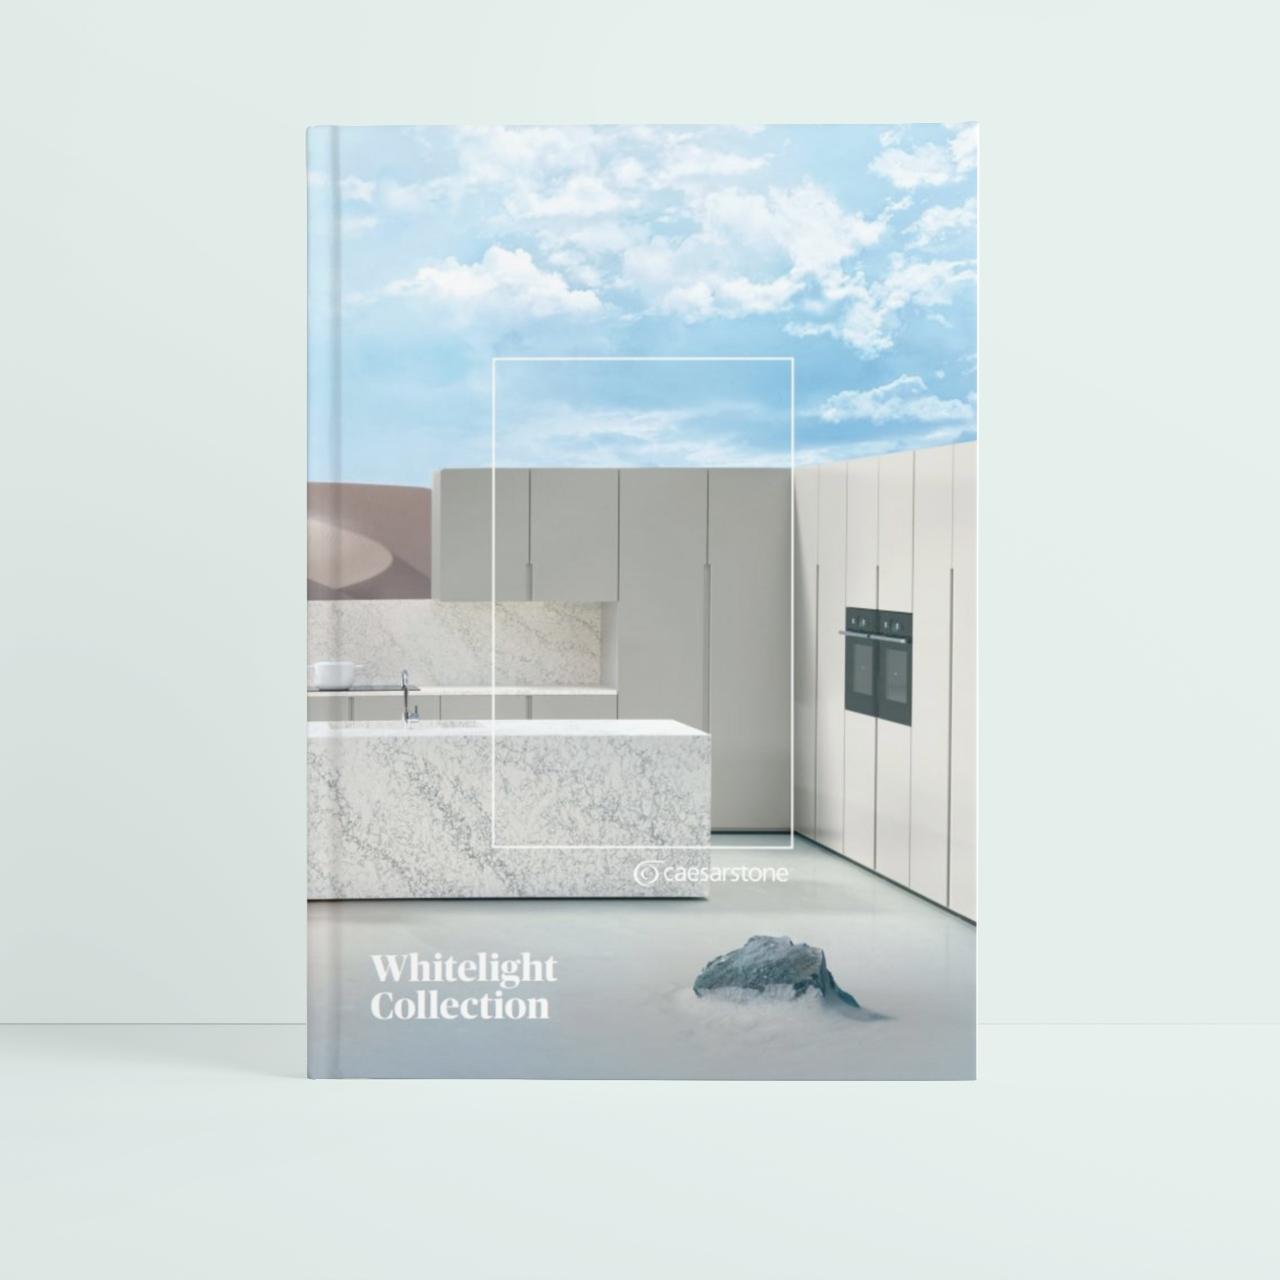 Whitelight Collection